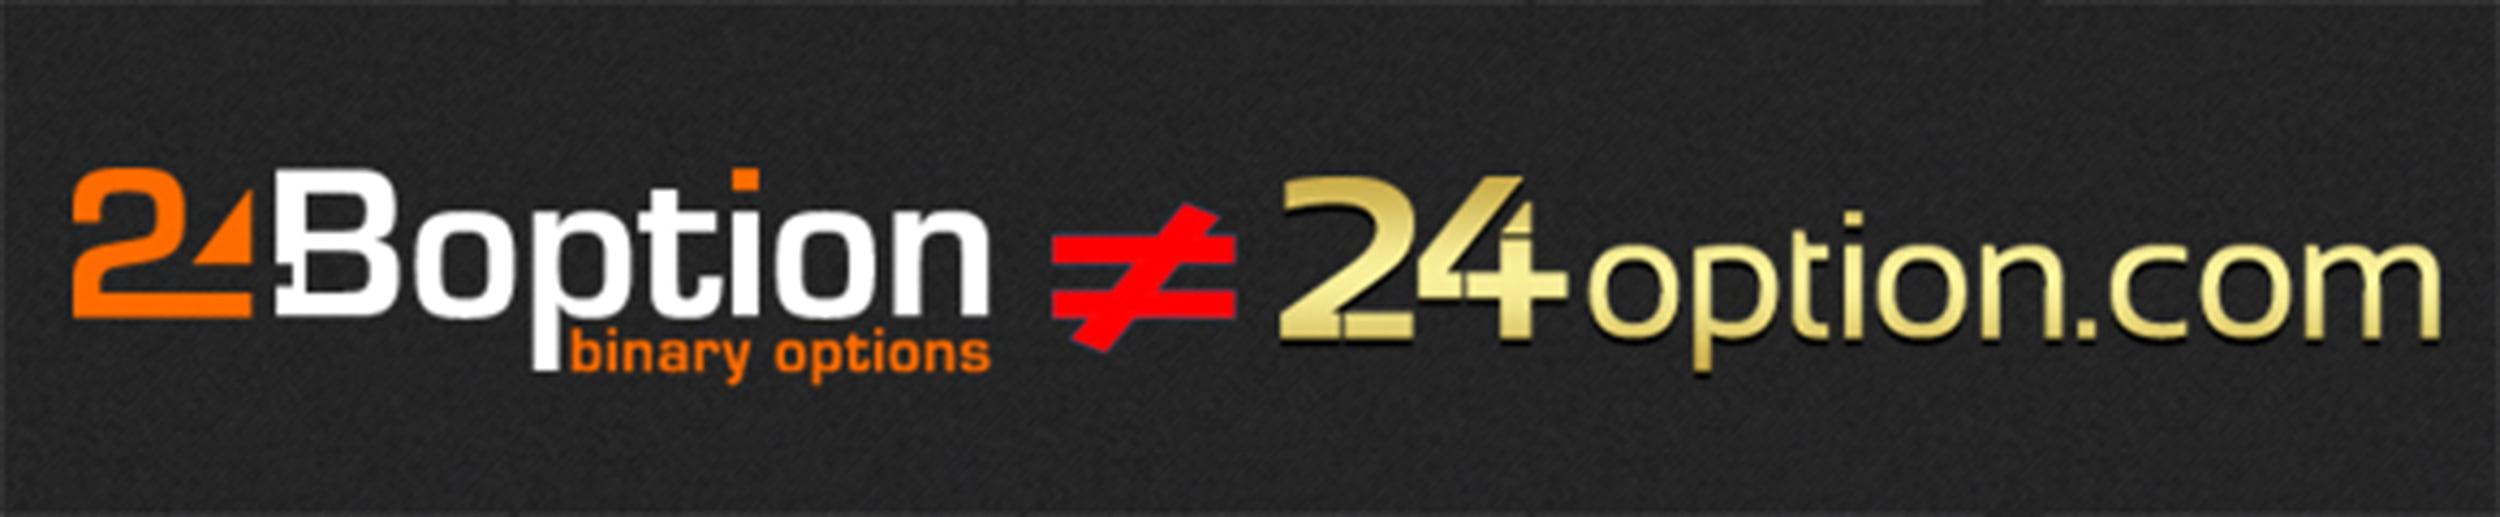 24boption - это клон 24option